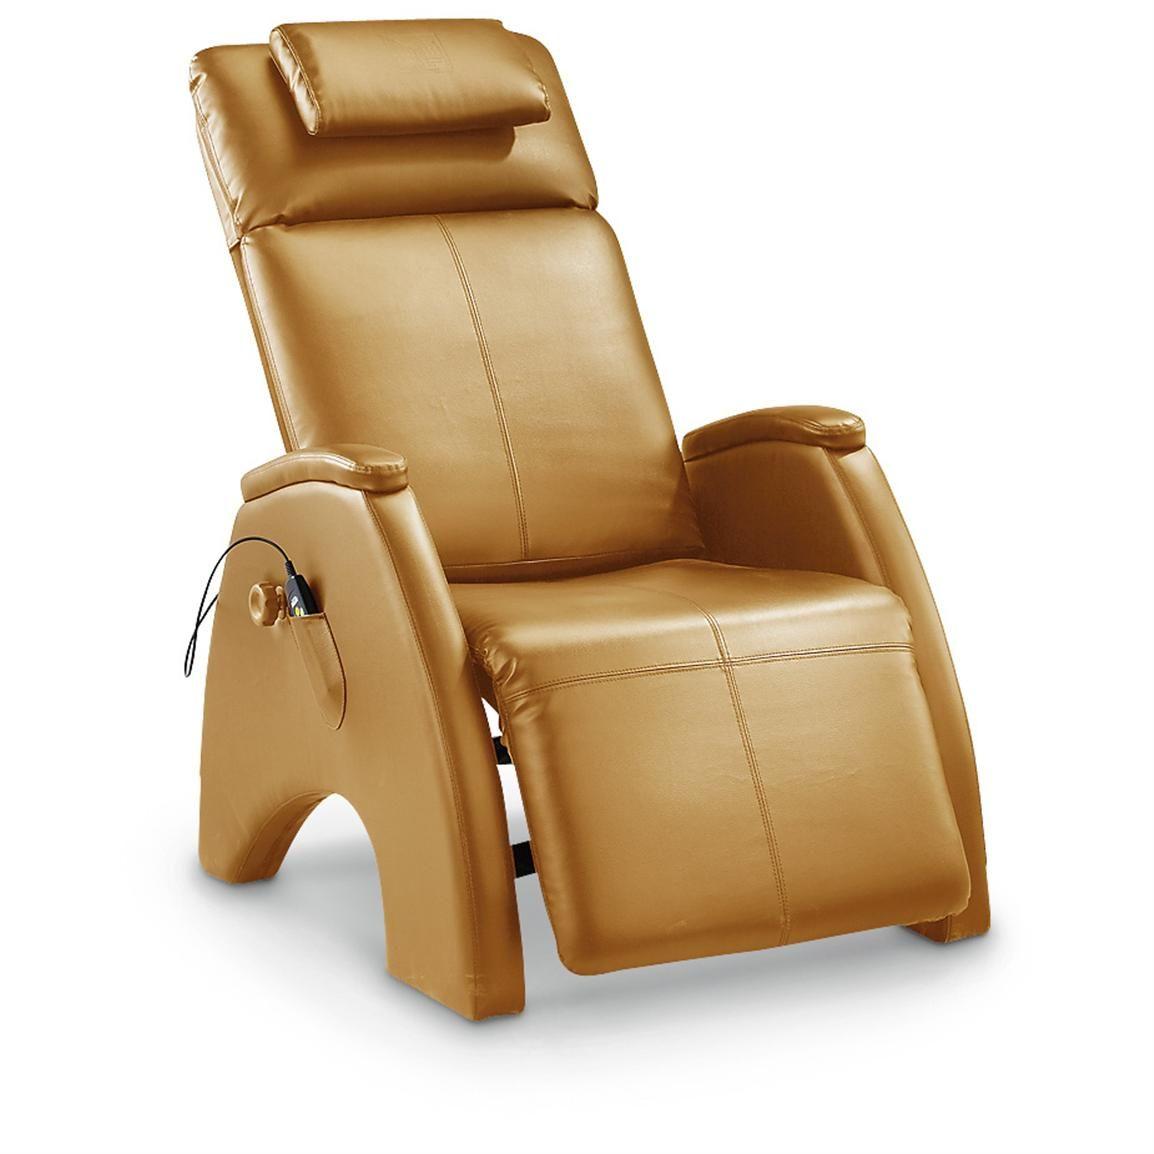 Tony Little® Anti gravity Massage Recliner Chair